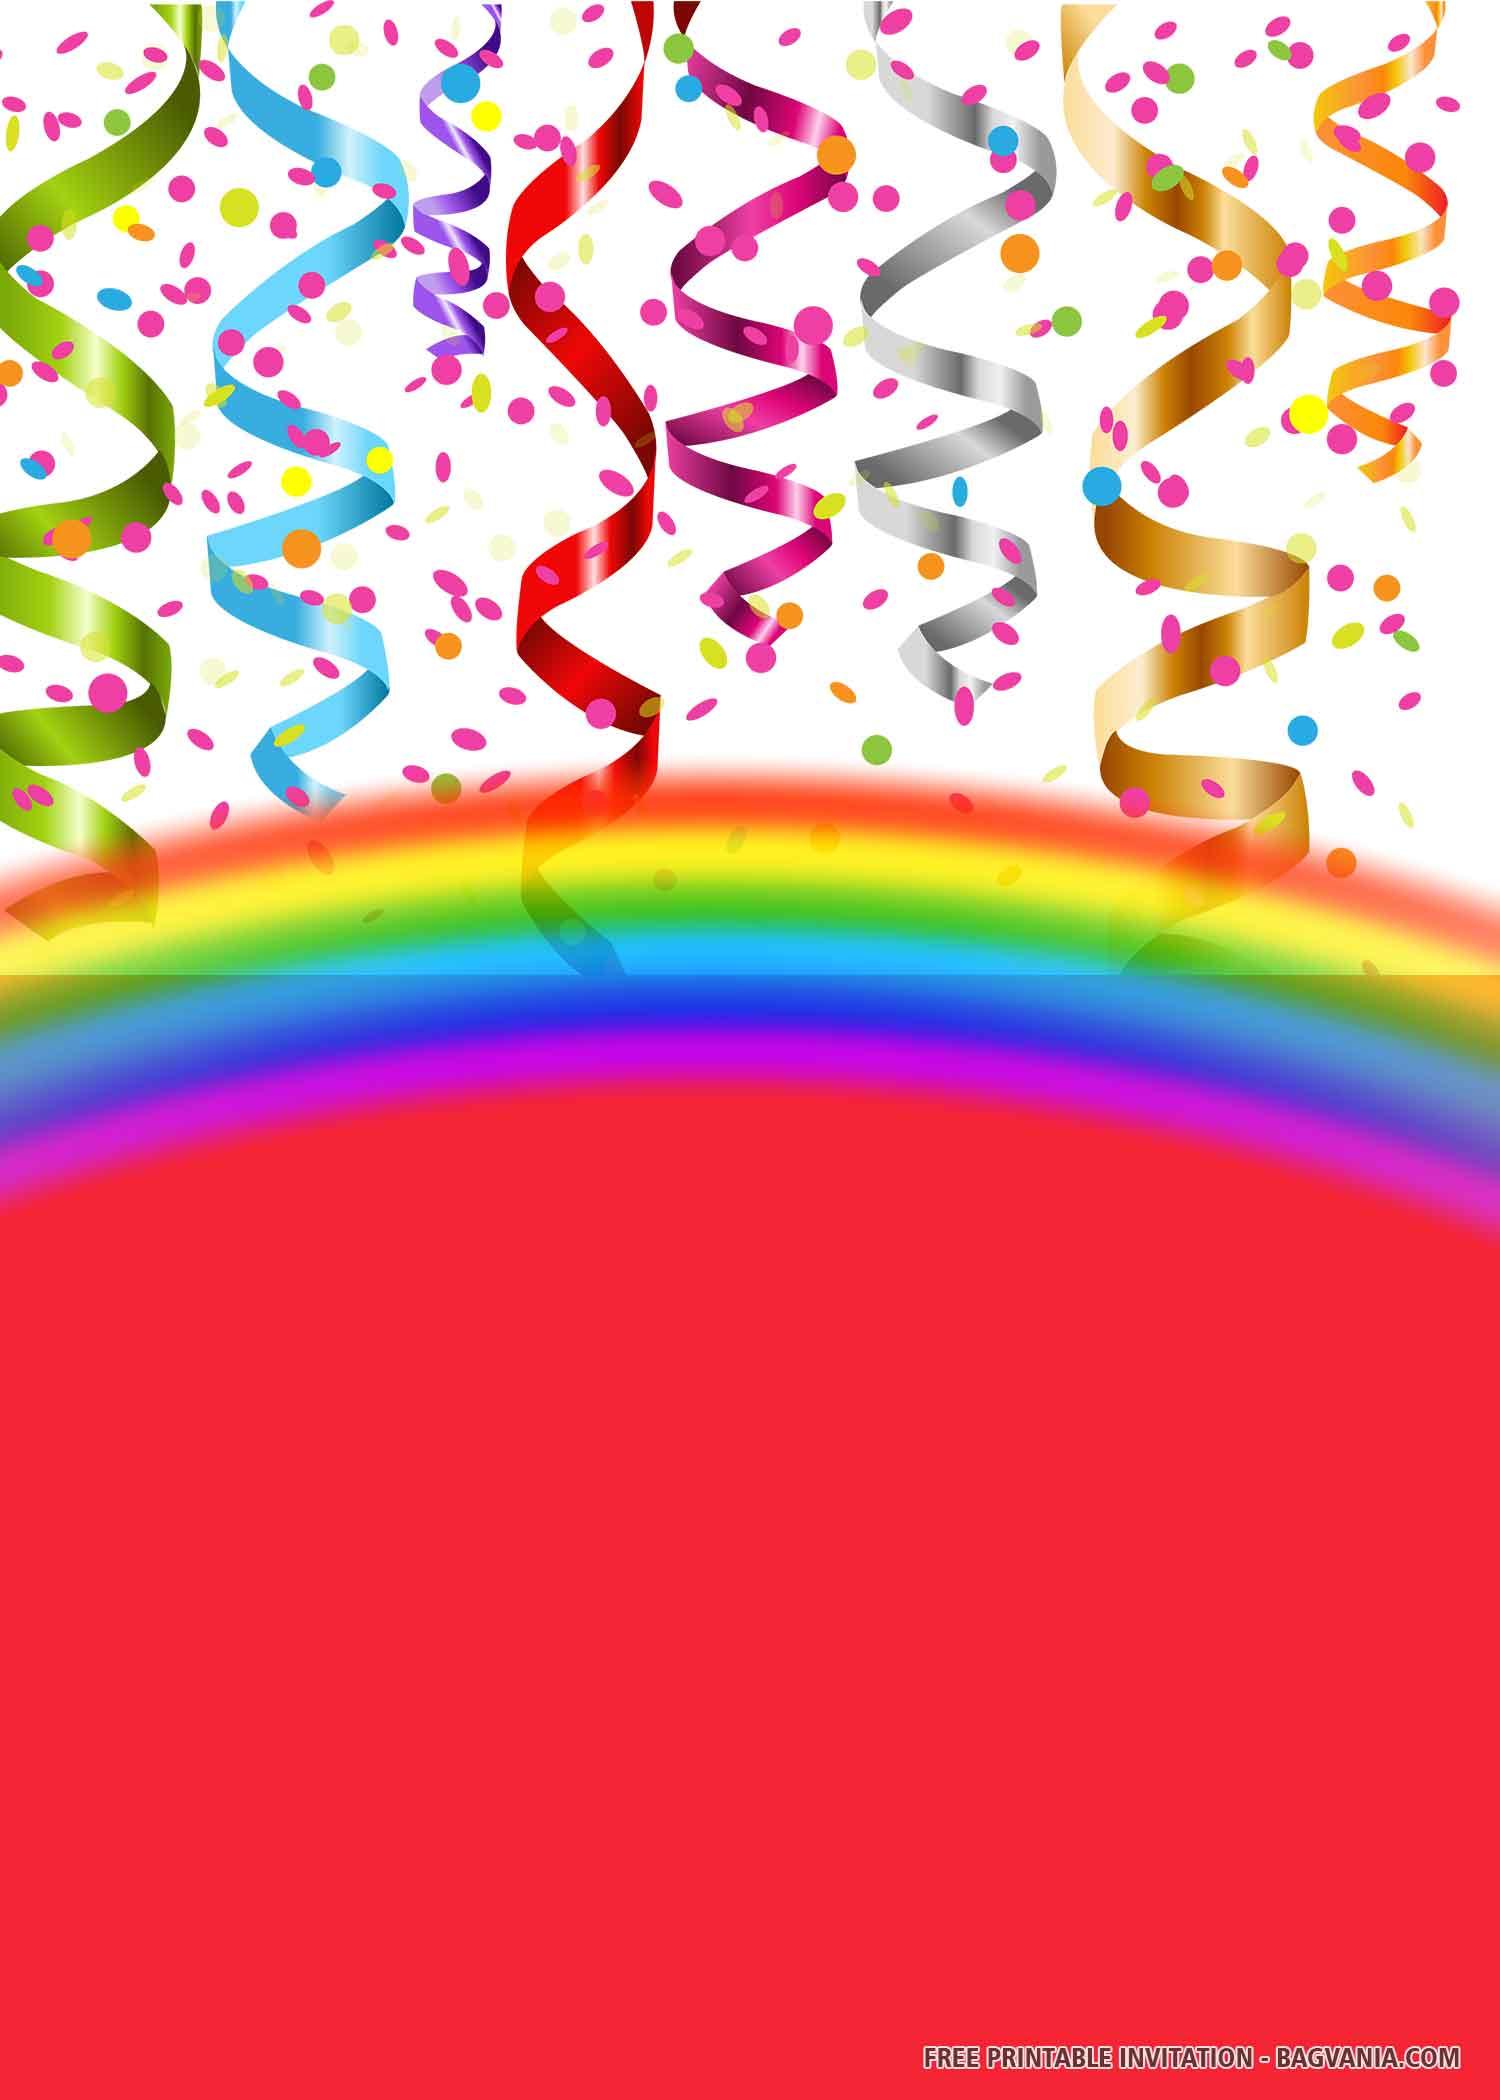 Free Printable Balloons Birthday Invitation Templates